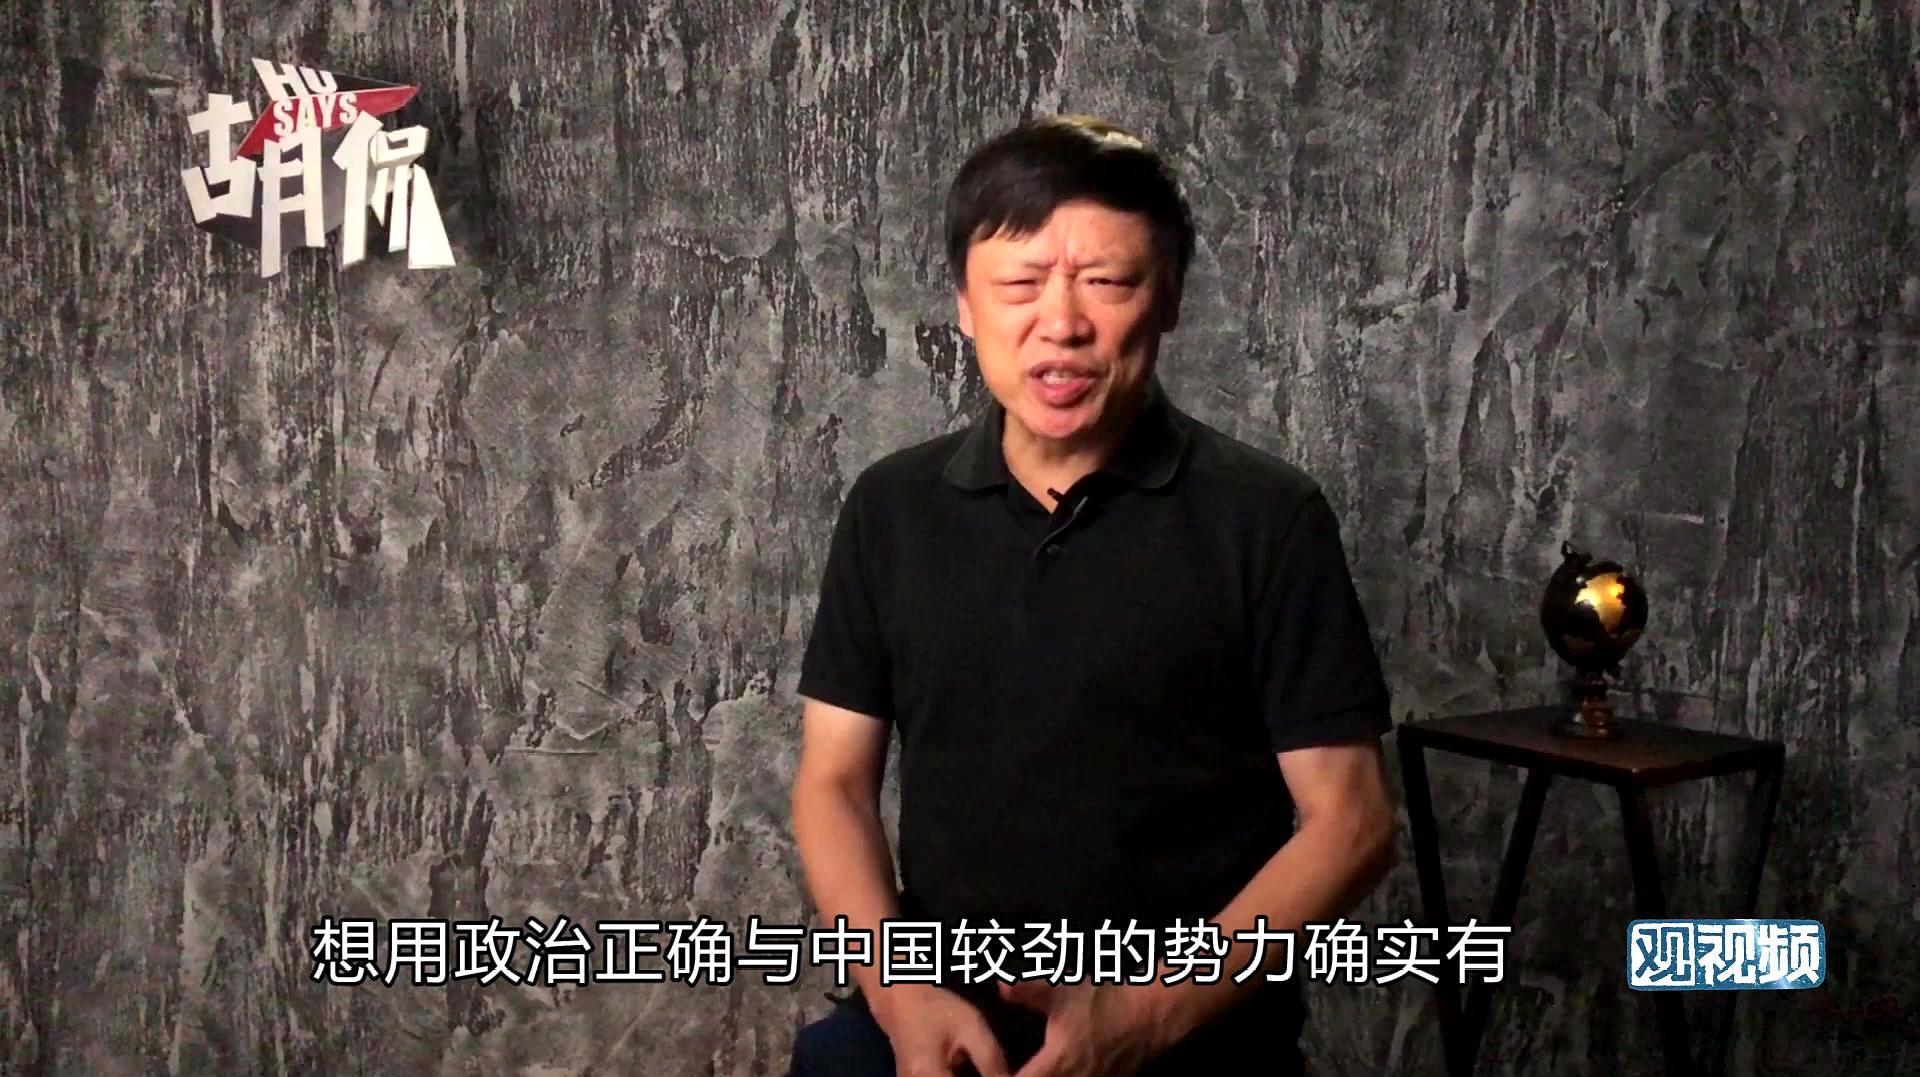 NBA总裁此时来上海,会不会越抹越黑?